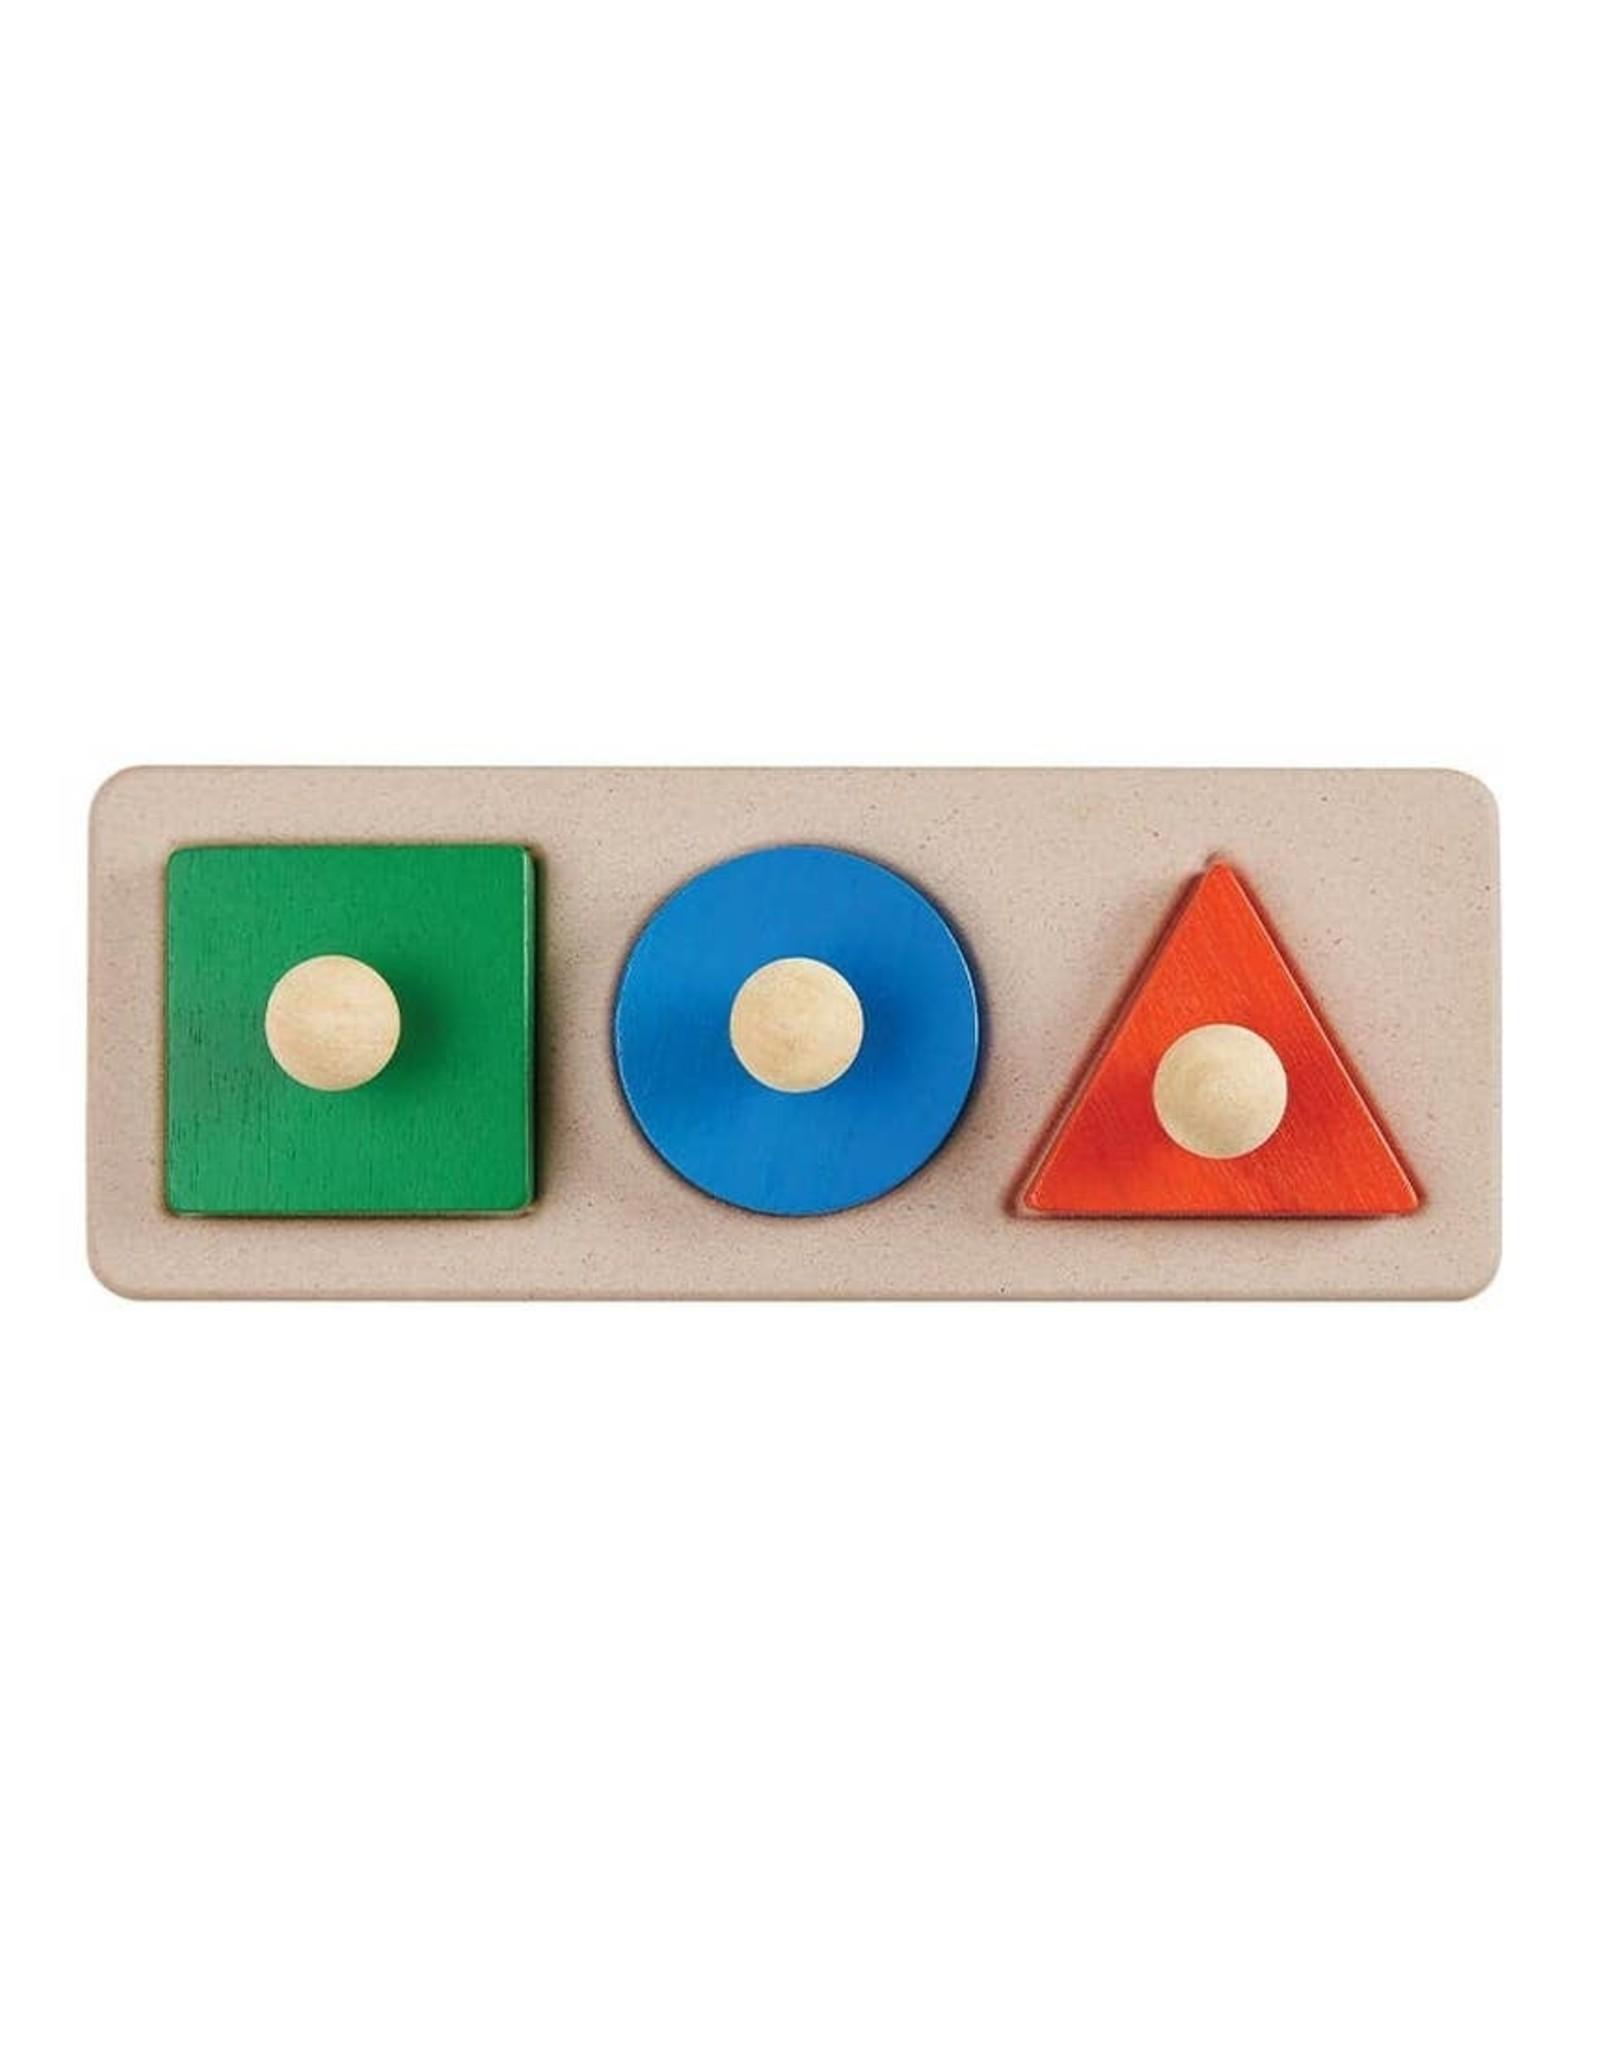 plan toys Shape Matching Puzzle